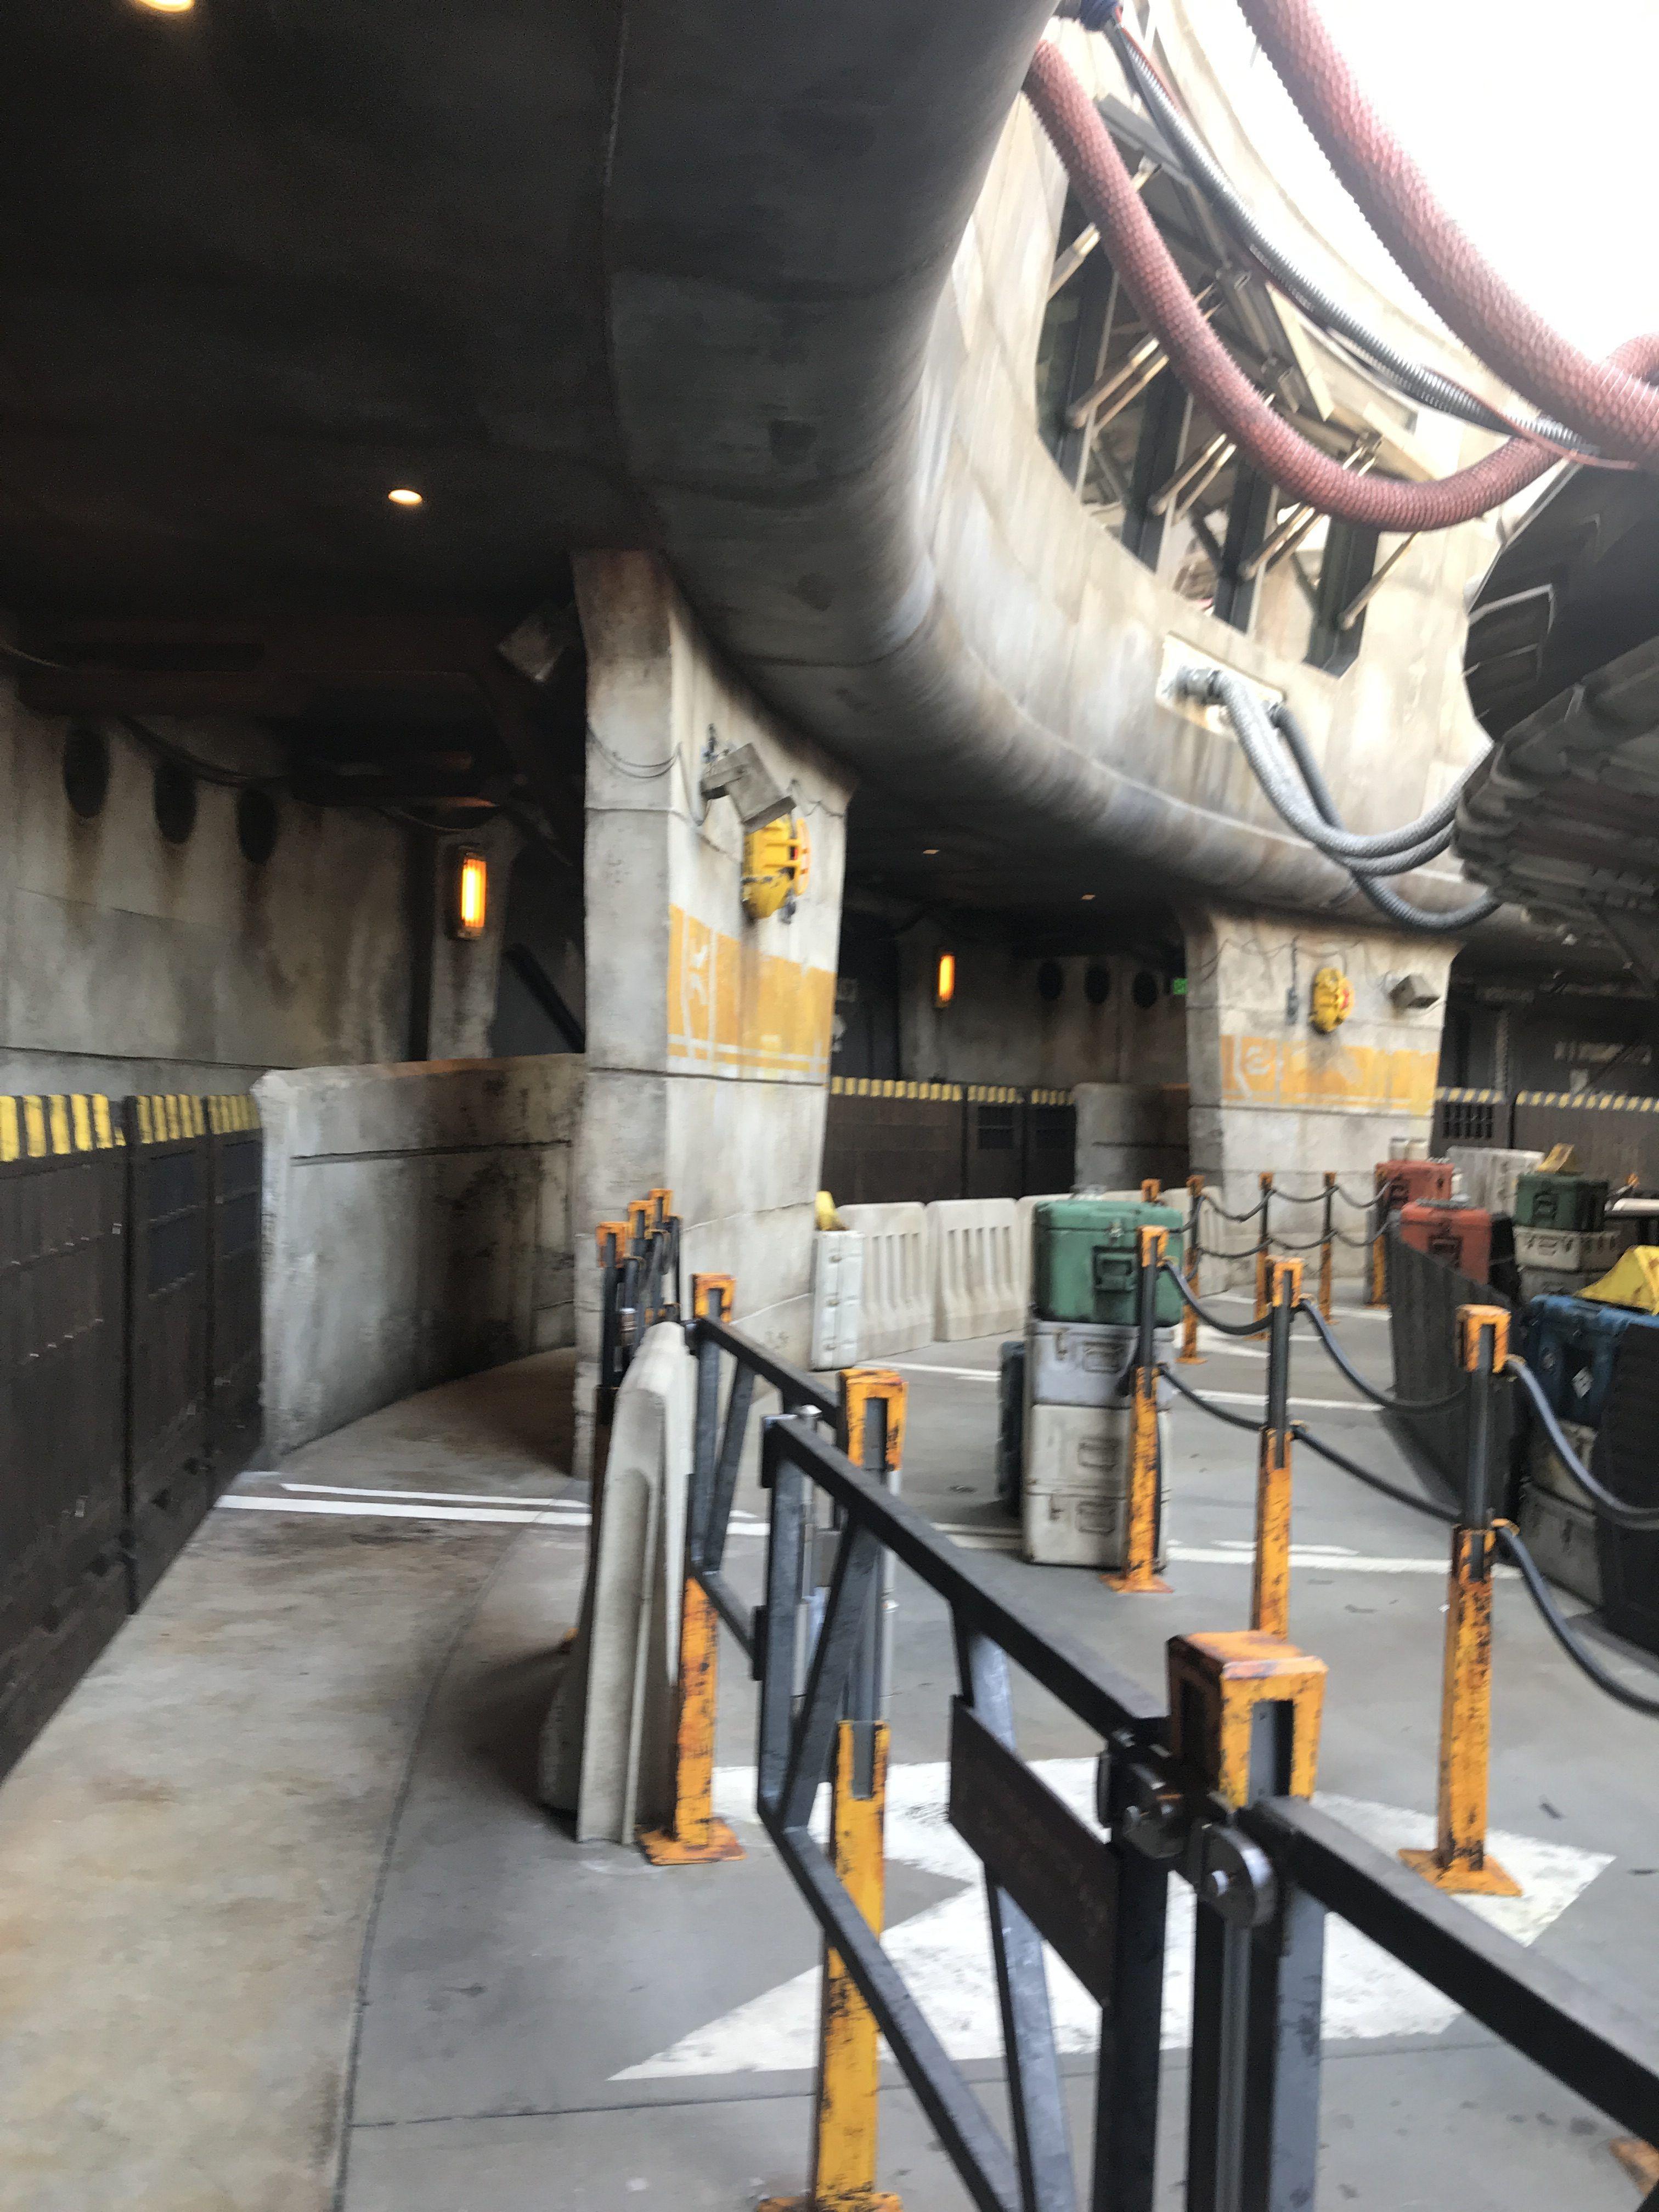 125+ Galaxy's Edge Images Take You Inside Disneyland's